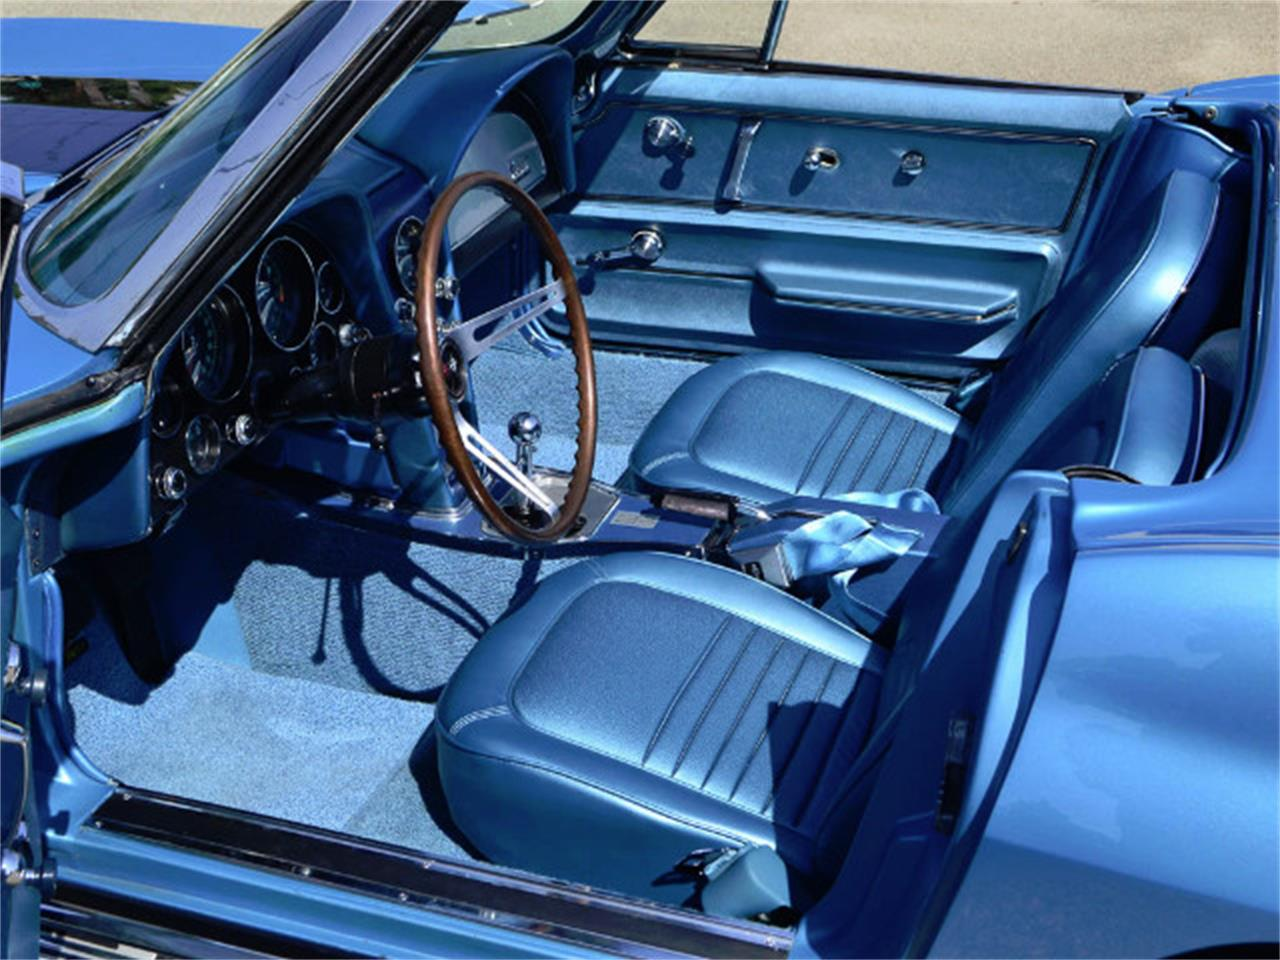 Large Picture of '67 Corvette located in Anaheim California - MQNE